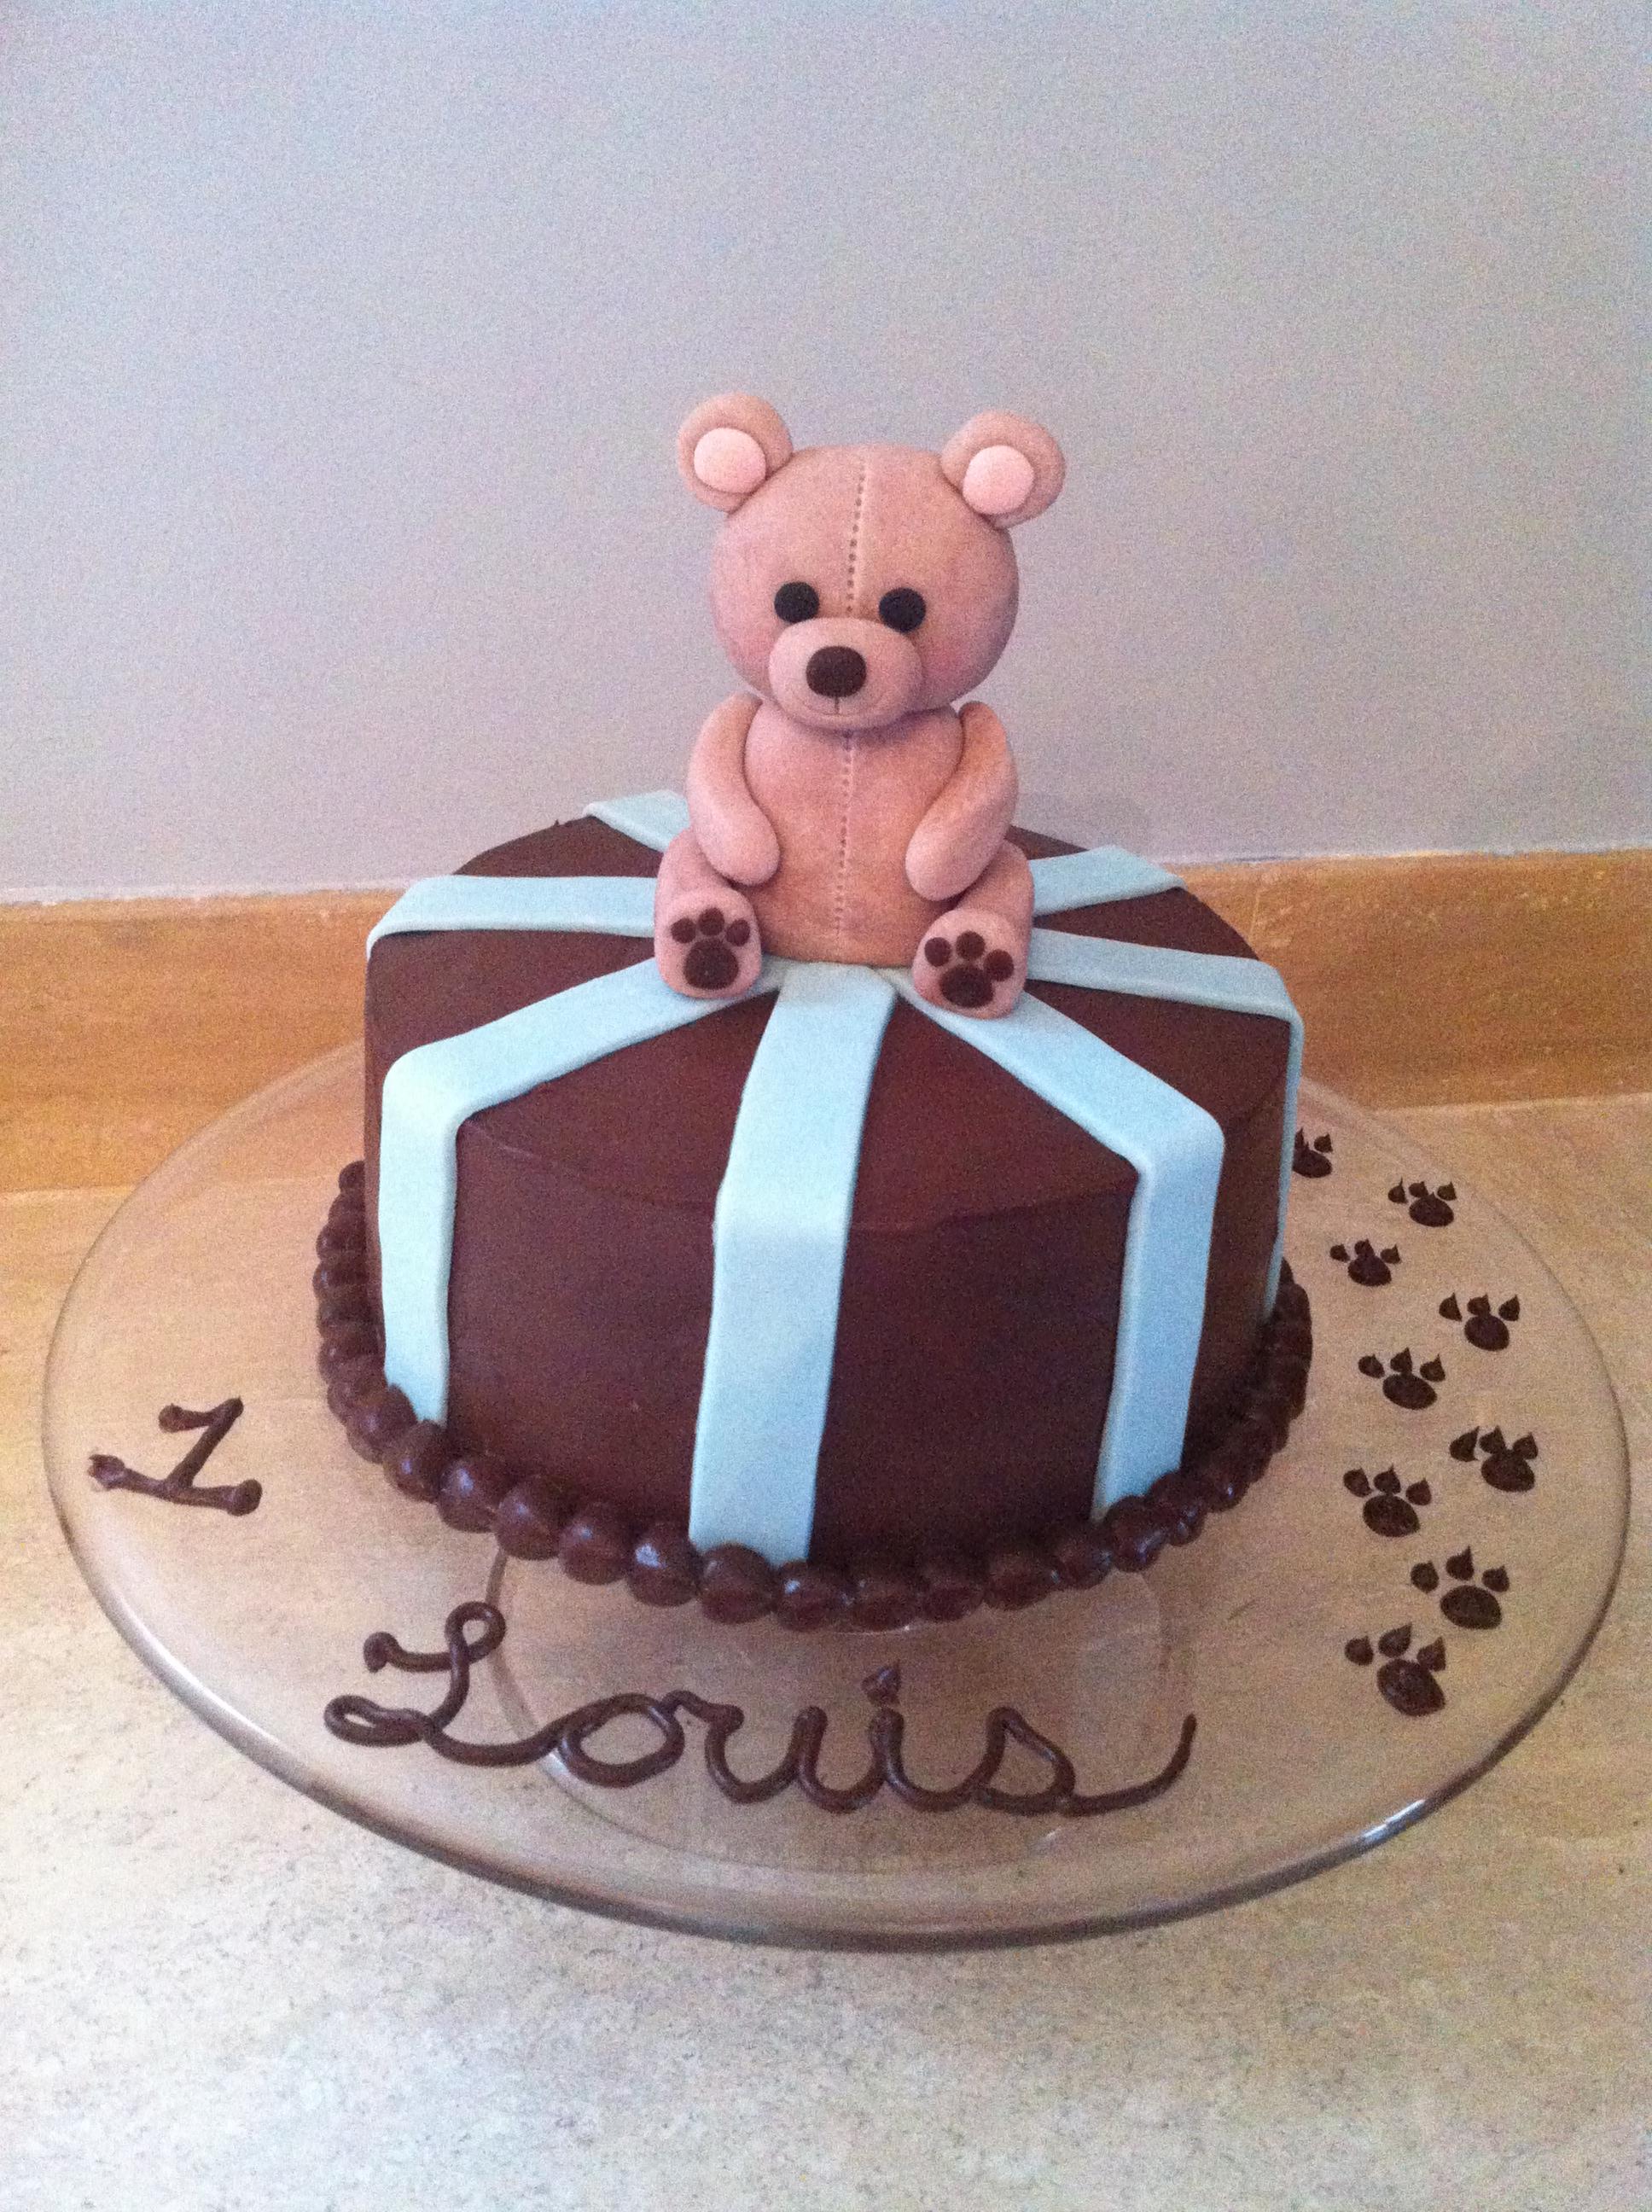 Teddy Bear for Baby Louis